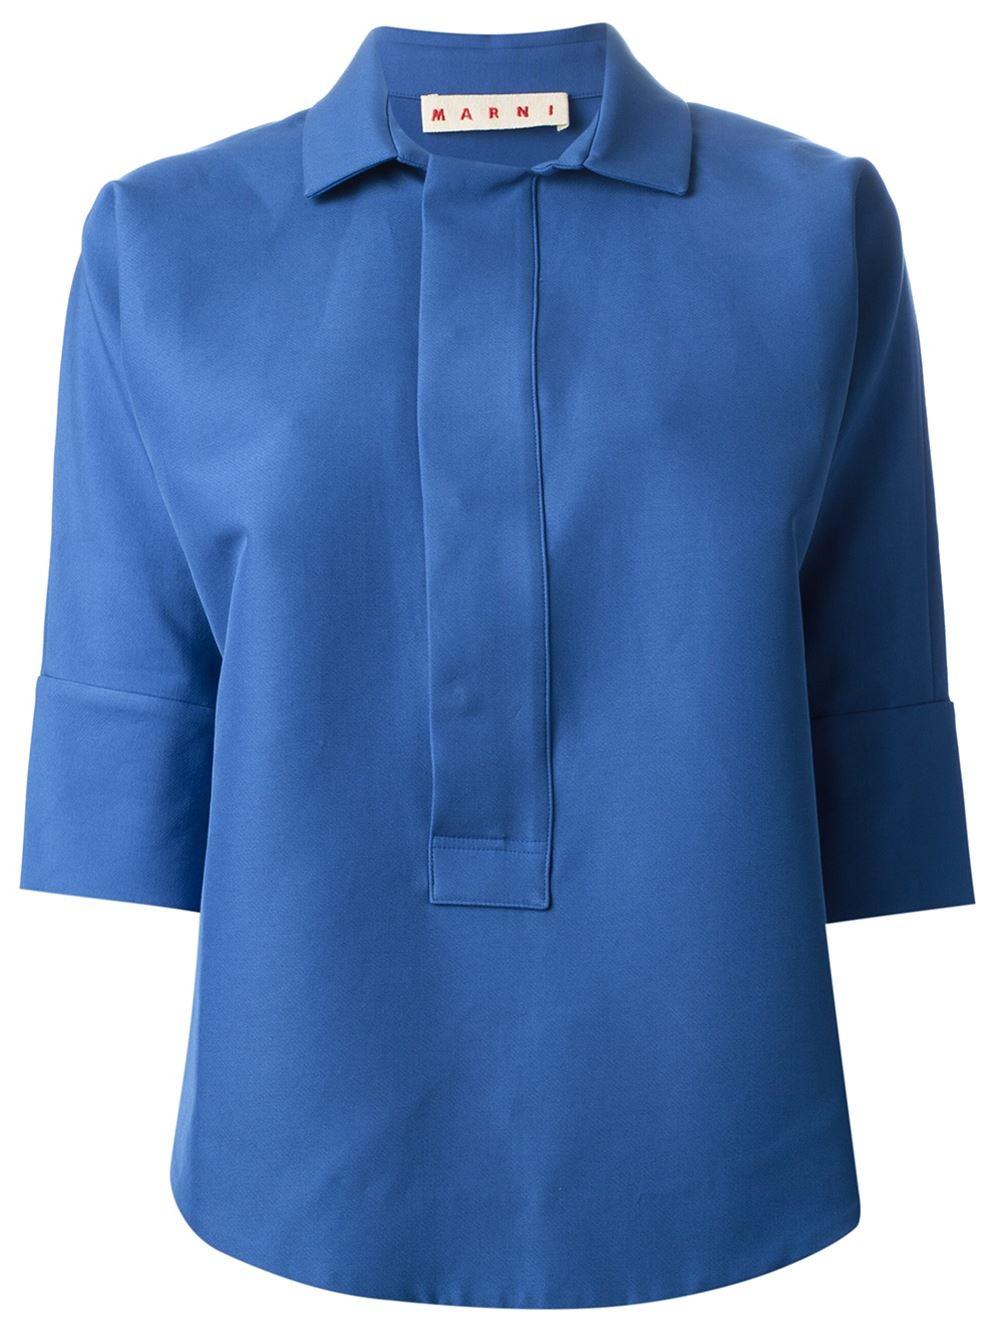 Marni Three Quarter Length Sleeve Shirt Torregrossa